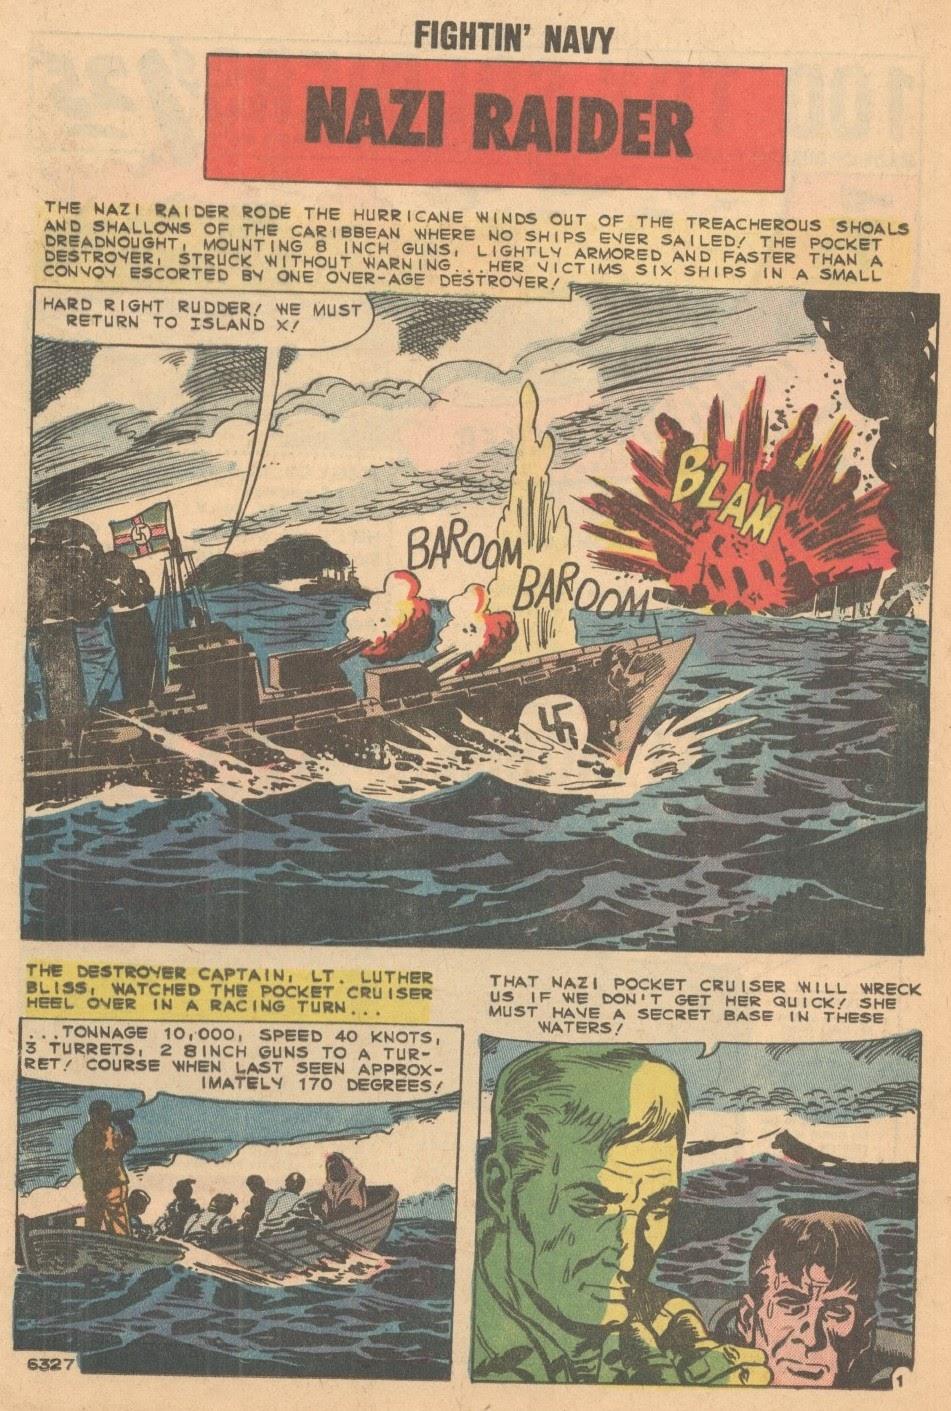 Read online Fightin' Navy comic -  Issue #93 - 16